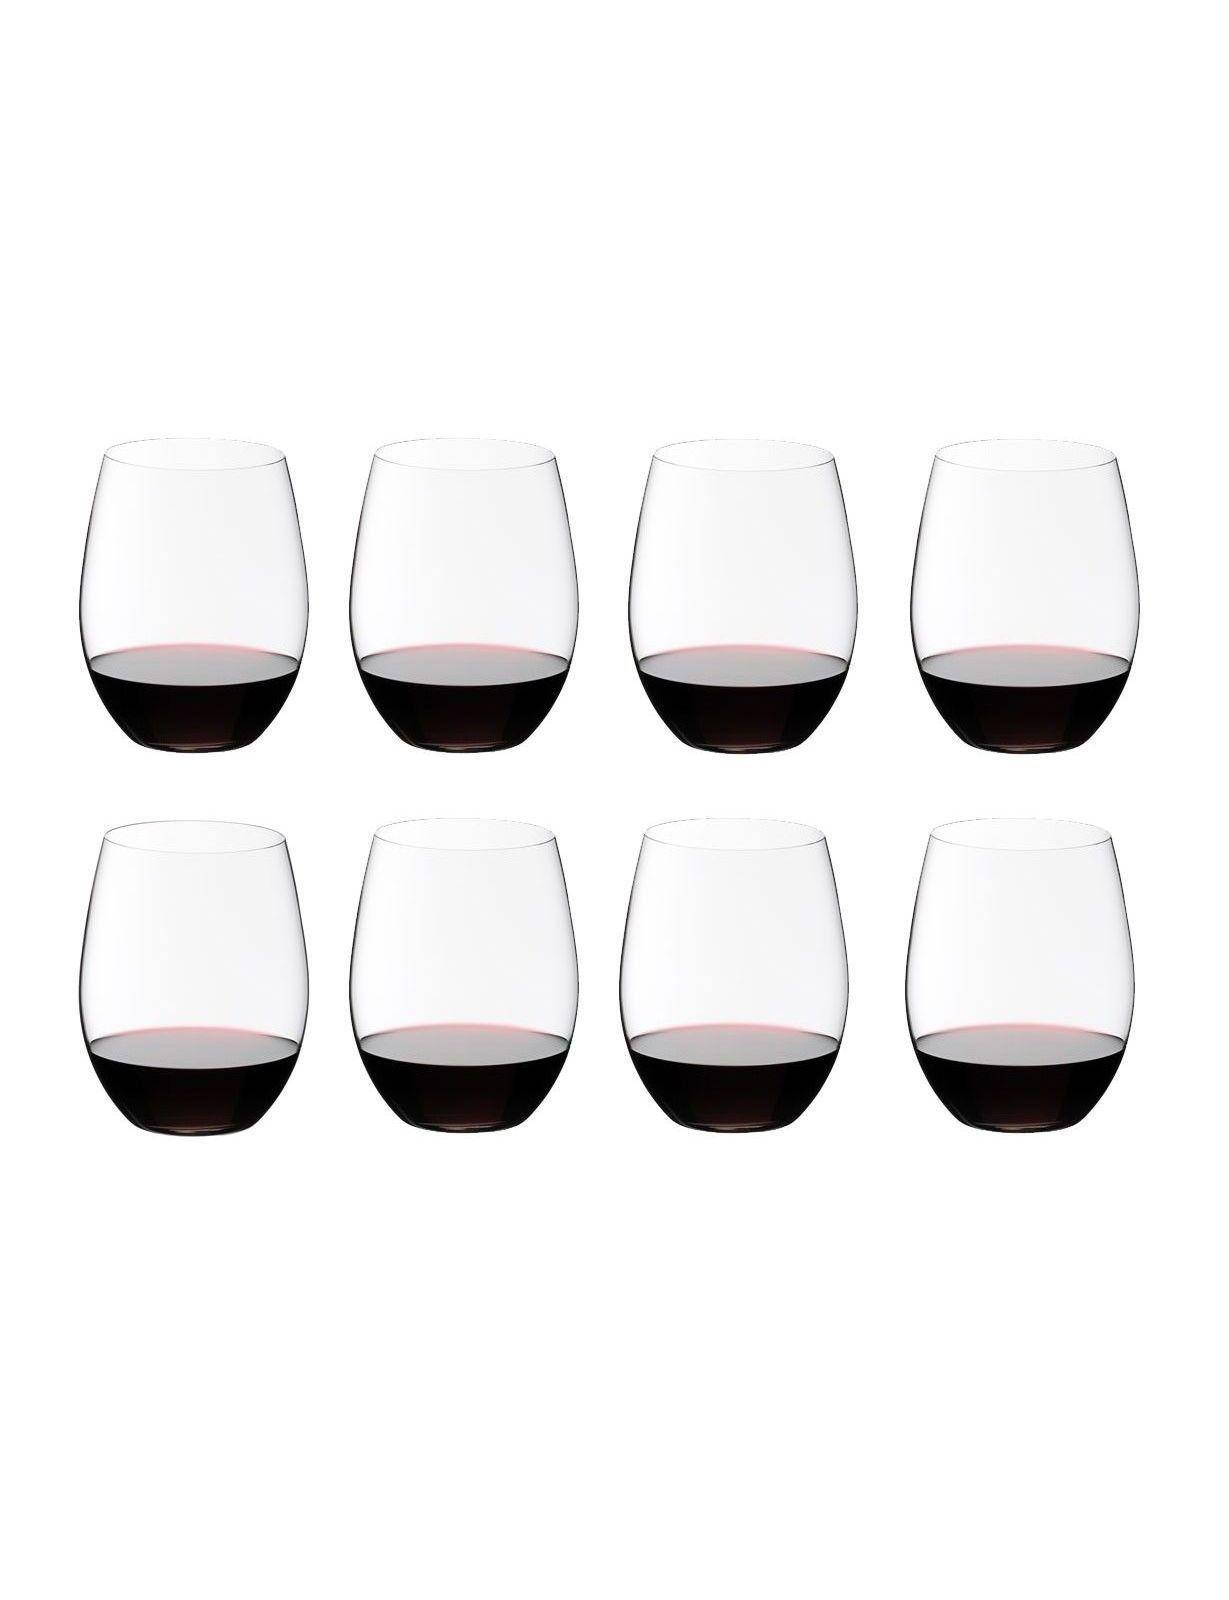 Бокалы Набор бокалов для красного вина 8шт 600 мл Riedel O Buy 8 Pay 6 Cabernet/Merlot nabor-bokalov-dlya-krasnogo-vina-8sht-600-ml-riedel-o-buy-8-pay-6-cabernetmerlot-avstriya.jpg